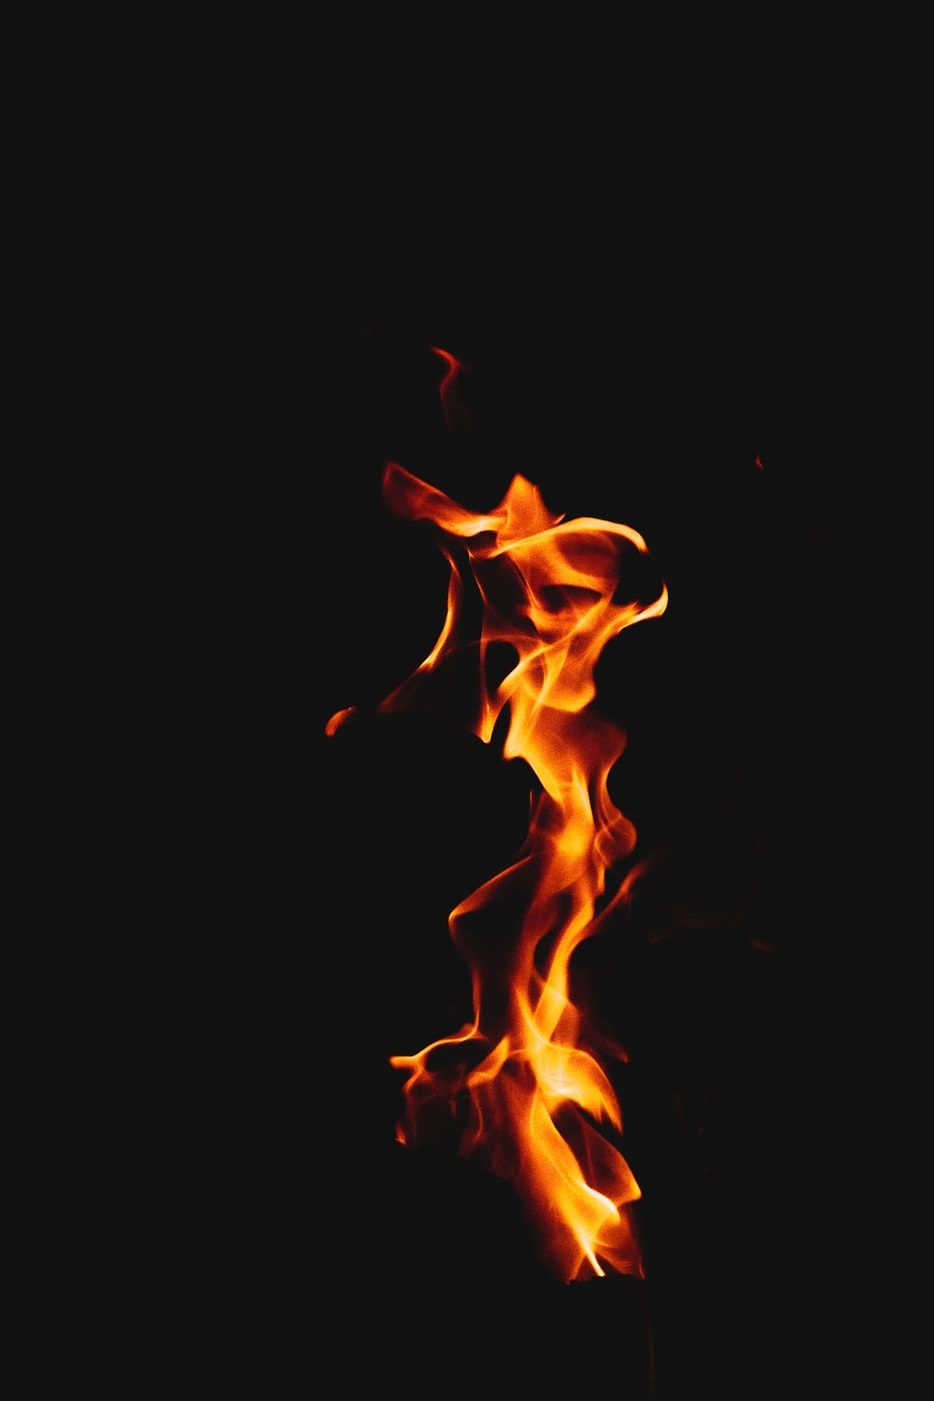 Orange Fire On Black Background Photo Free Fire Image On Unsplash Dark Wallpaper Black Hd Wallpaper Black Wallpaper Iphone Dark